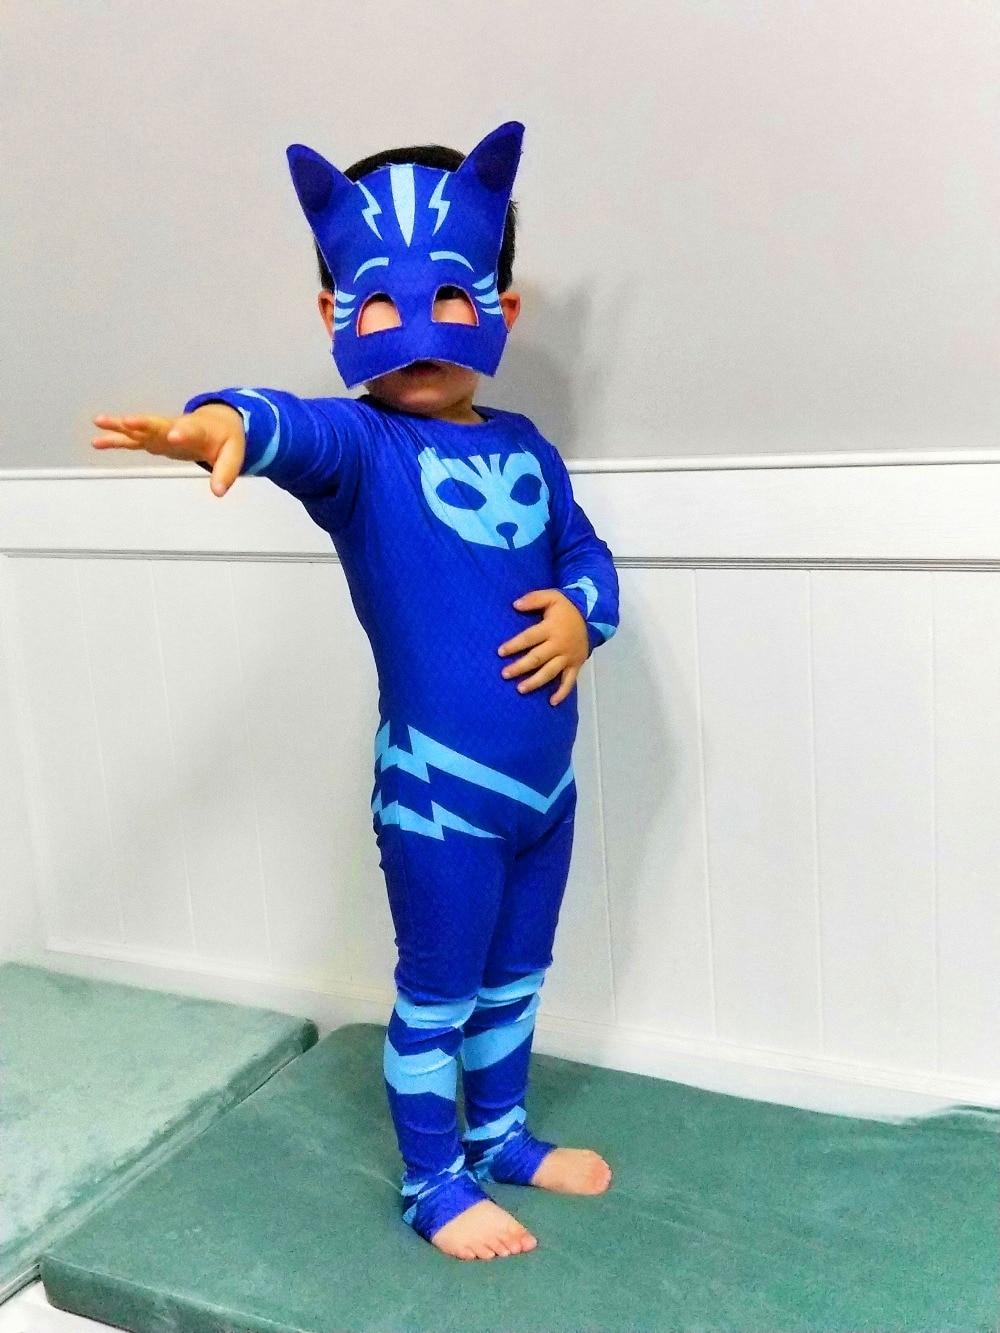 Grosir Costume Pj Masks Gallery Buy Low Price Mask Topeng Lots On Aliexpresscom